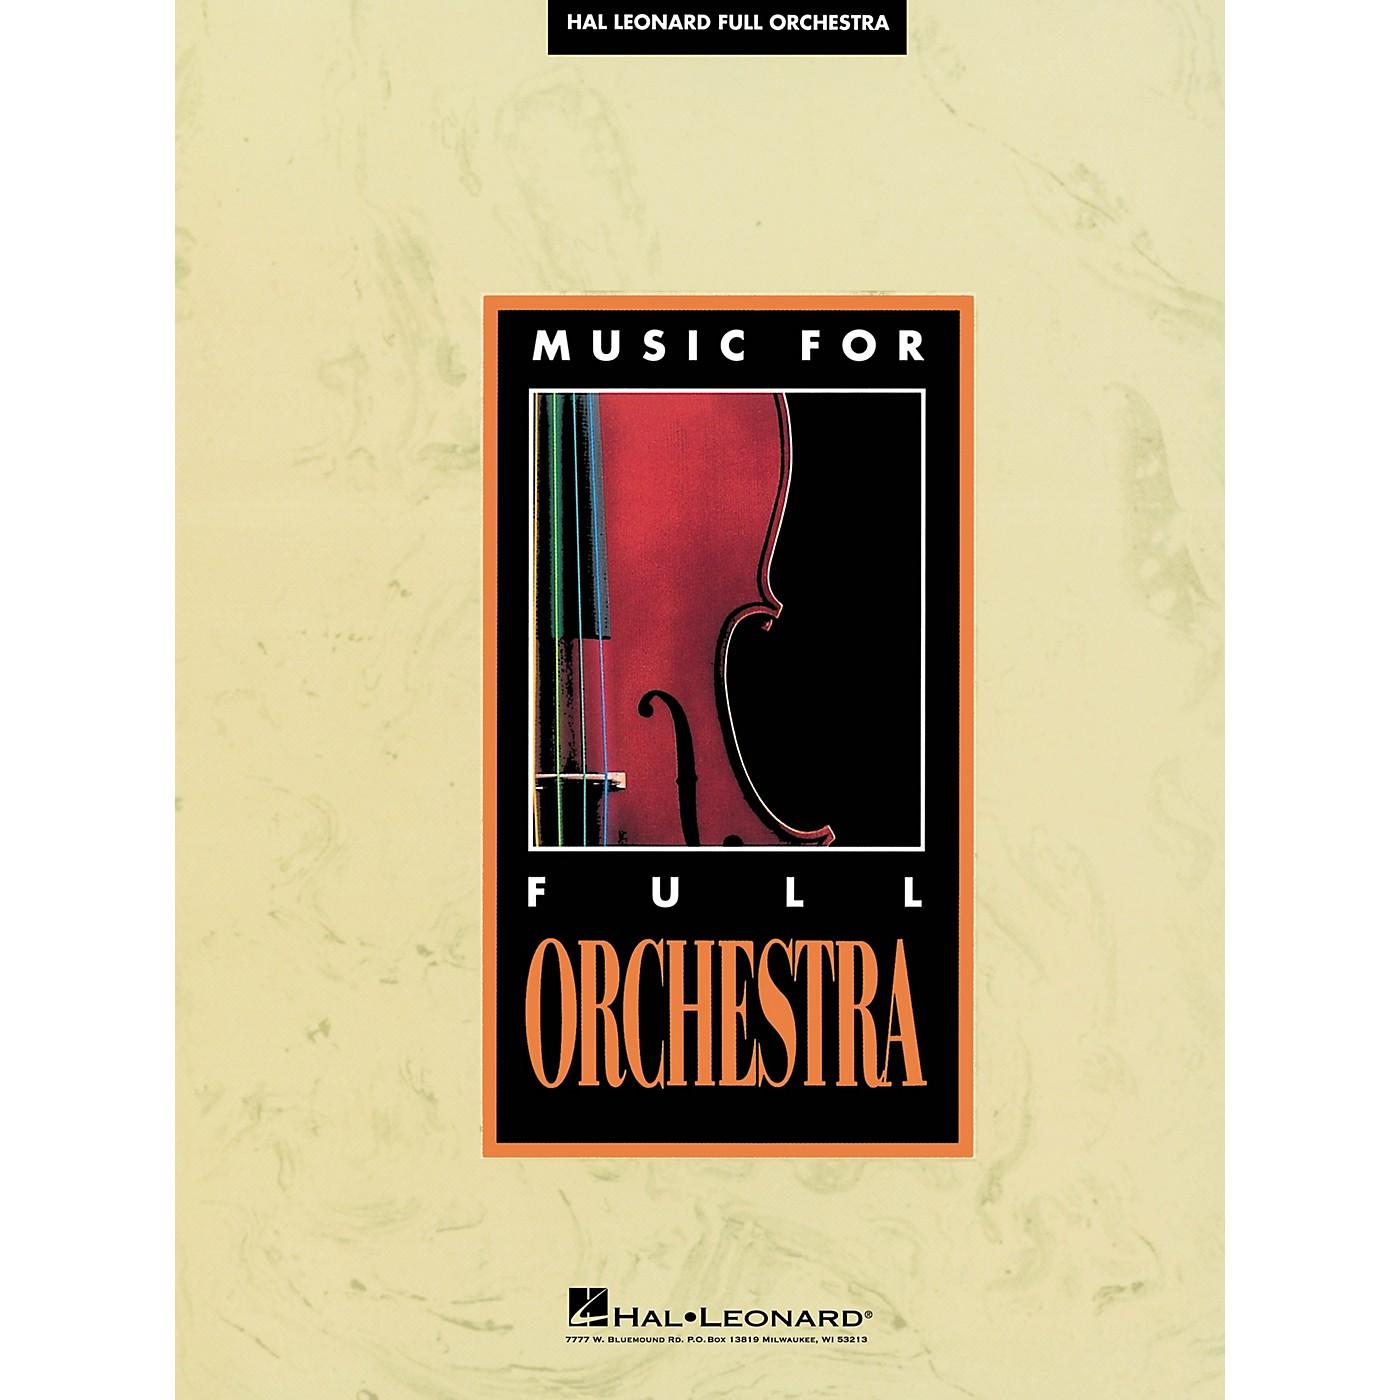 Ricordi Sinfonia in B Minor for Strings and Basso Continuo Al Santo Sepolcro RV169 Orchestra by Vivaldi thumbnail